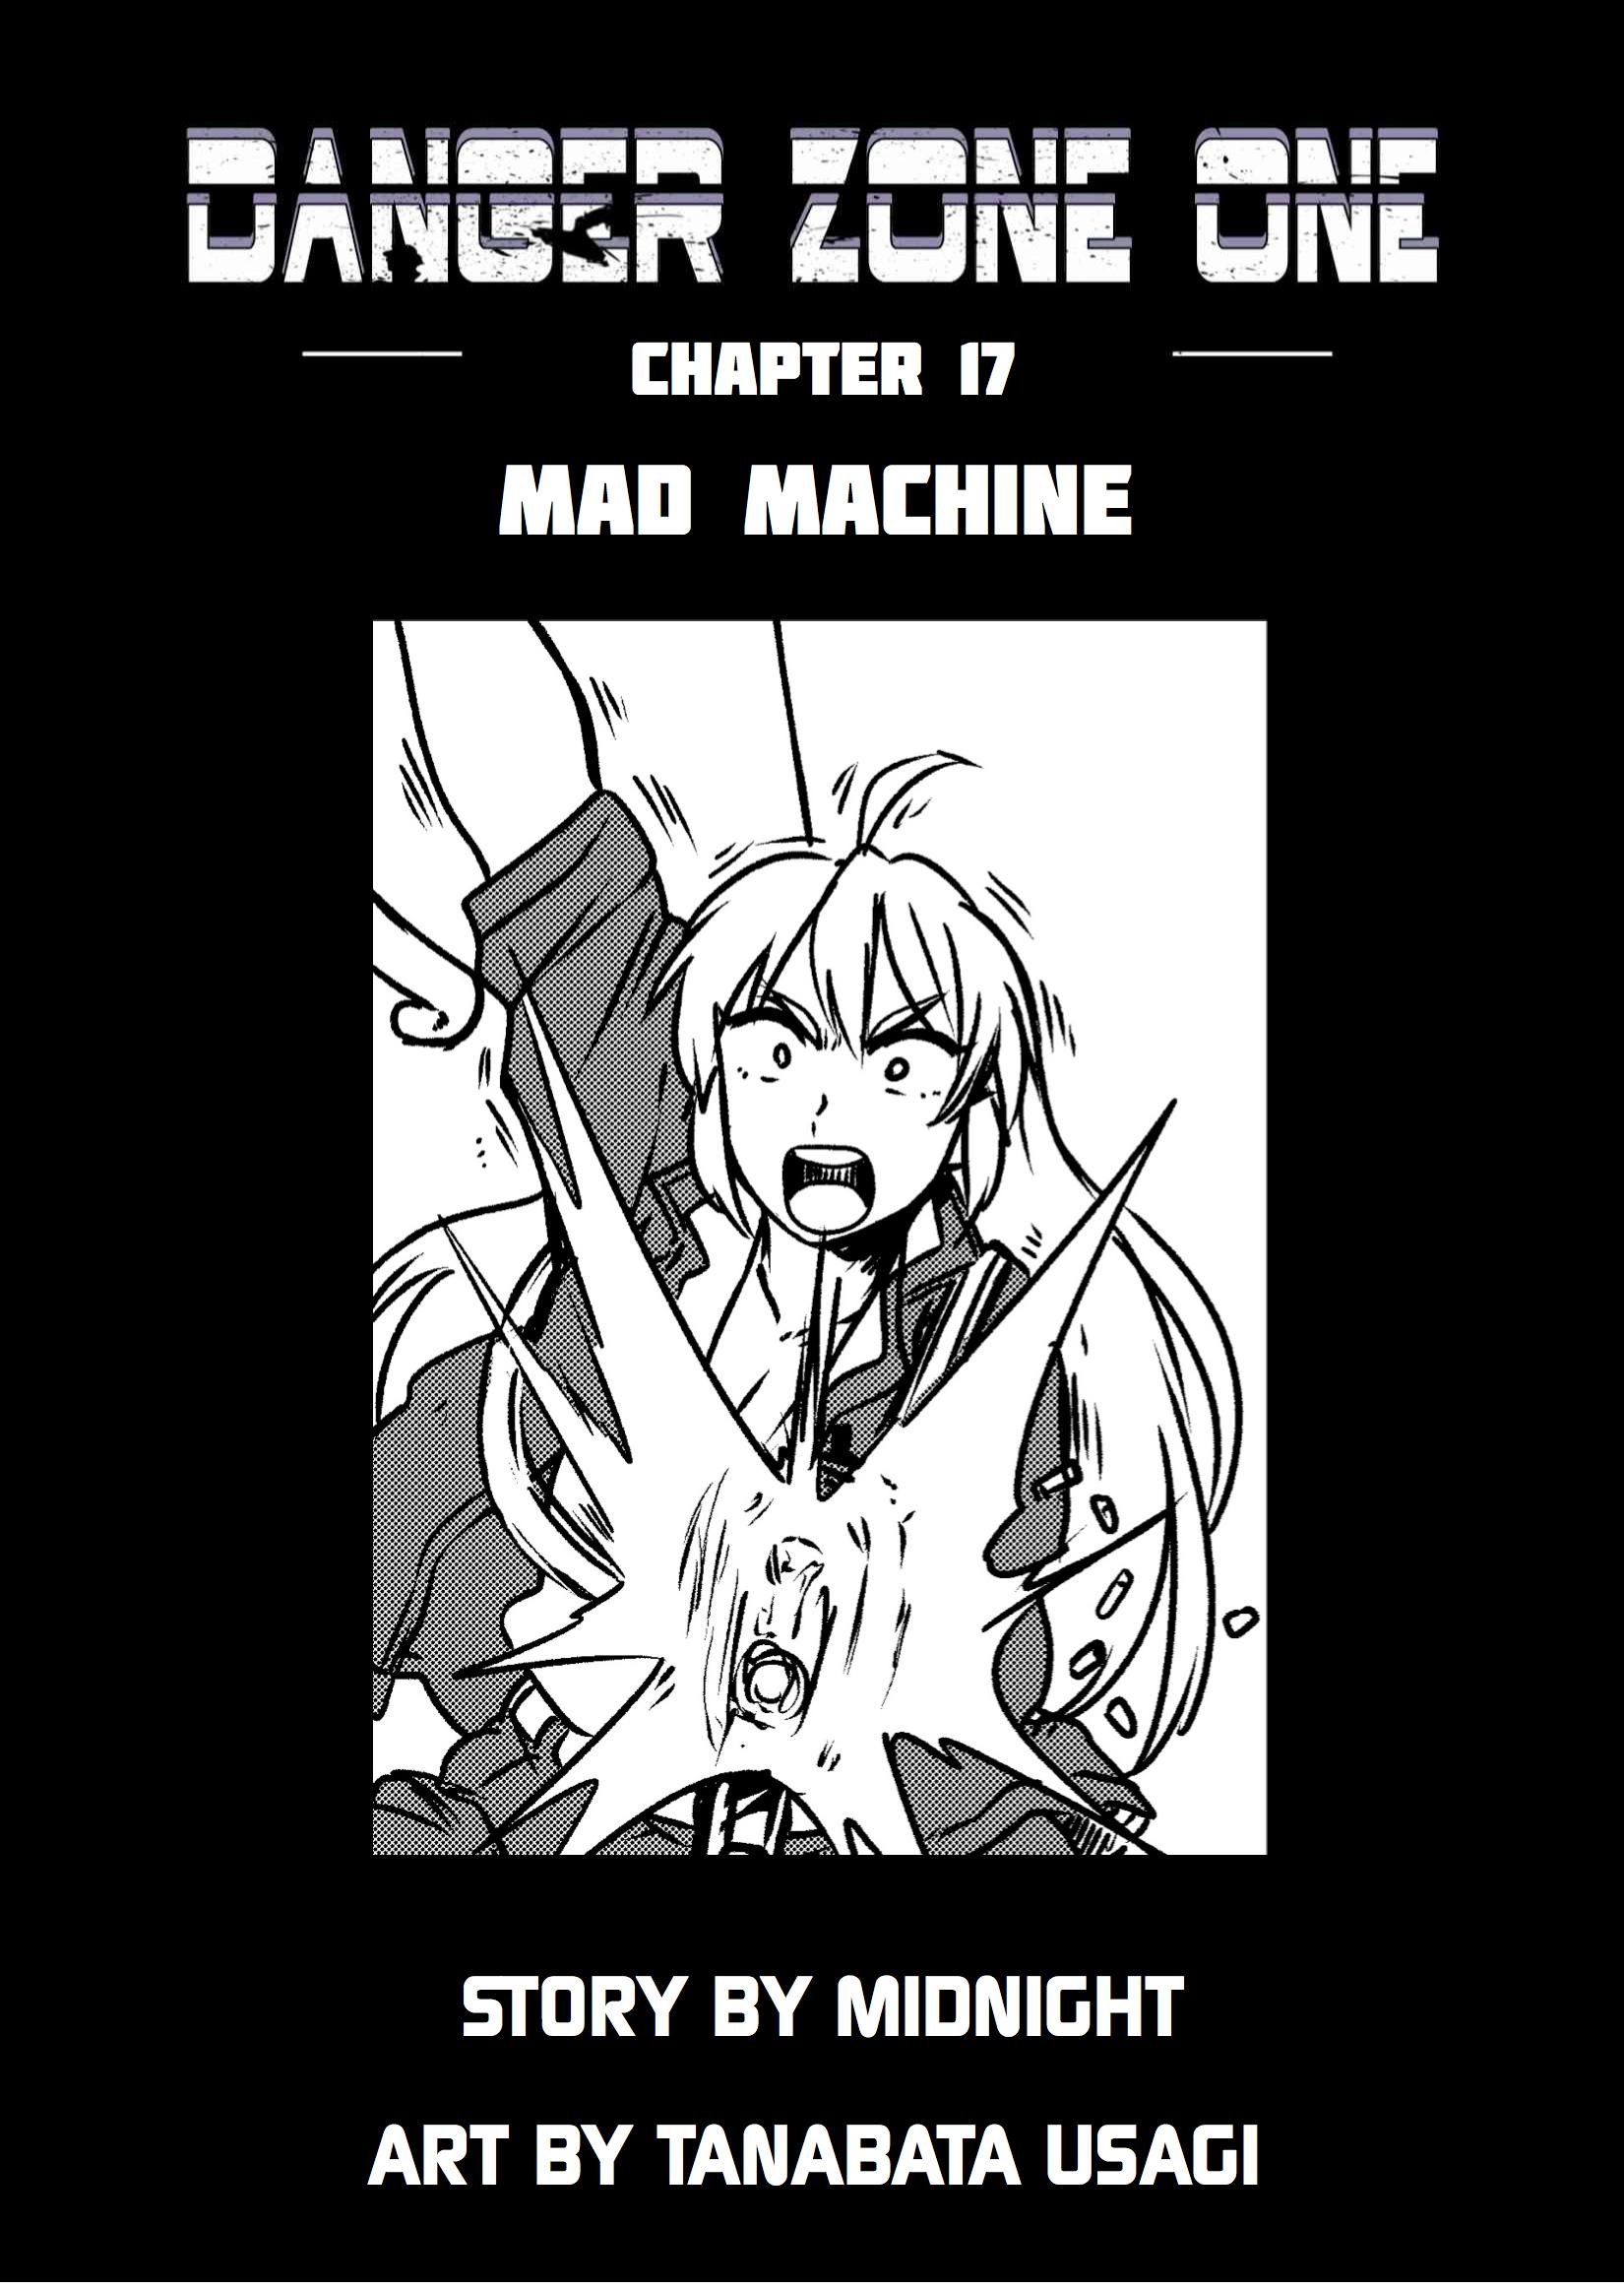 Chapter 17: Mad Machine